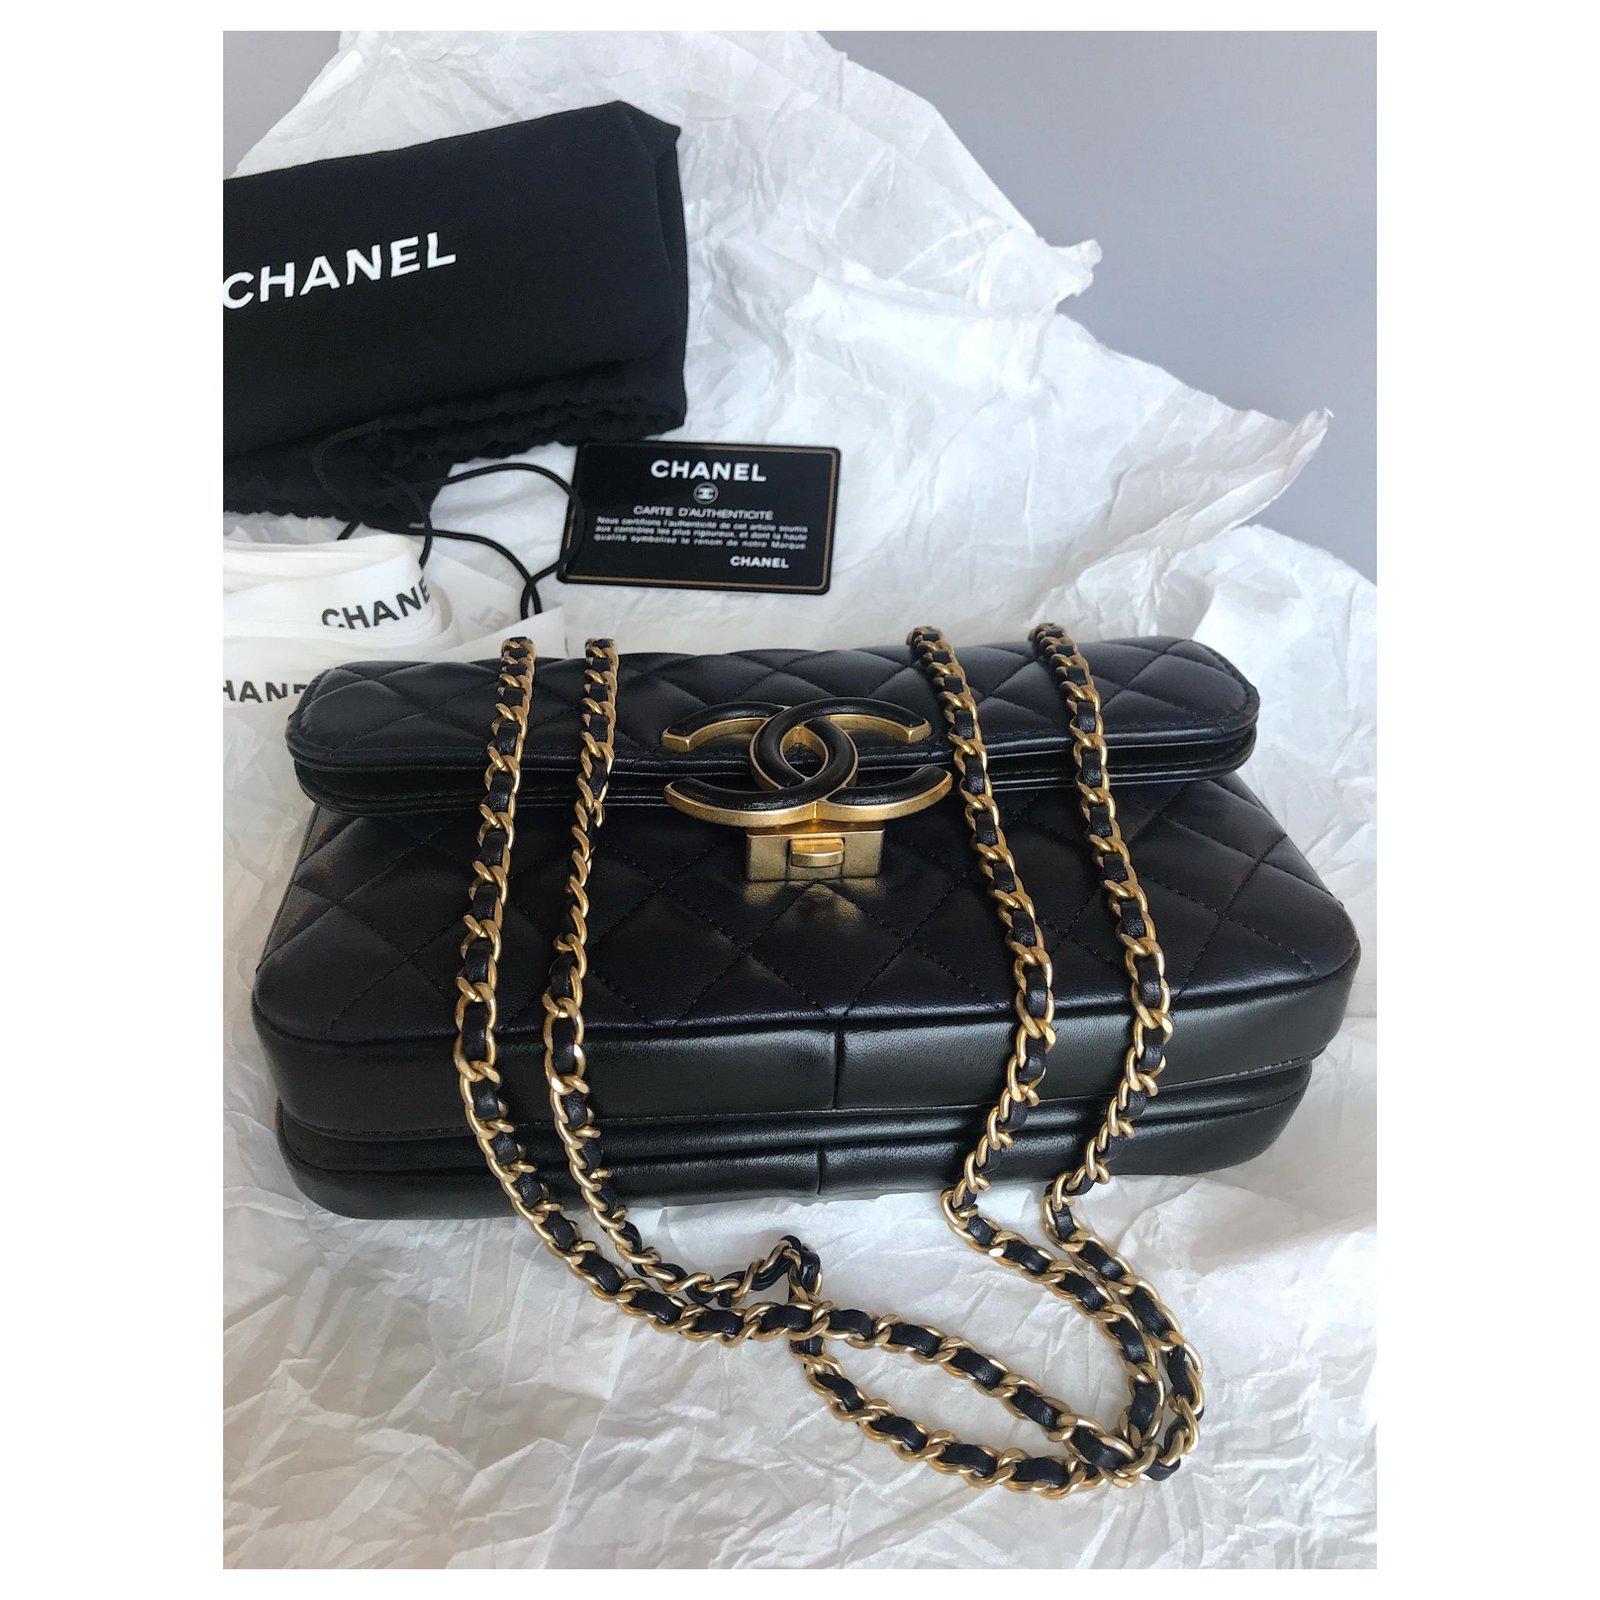 63b9e61183c8 Chanel 2018 Avec carte ,Boite, dustbag! Handbags Leather Black,Navy  blue,Dark blue ref.113294 - Joli Closet